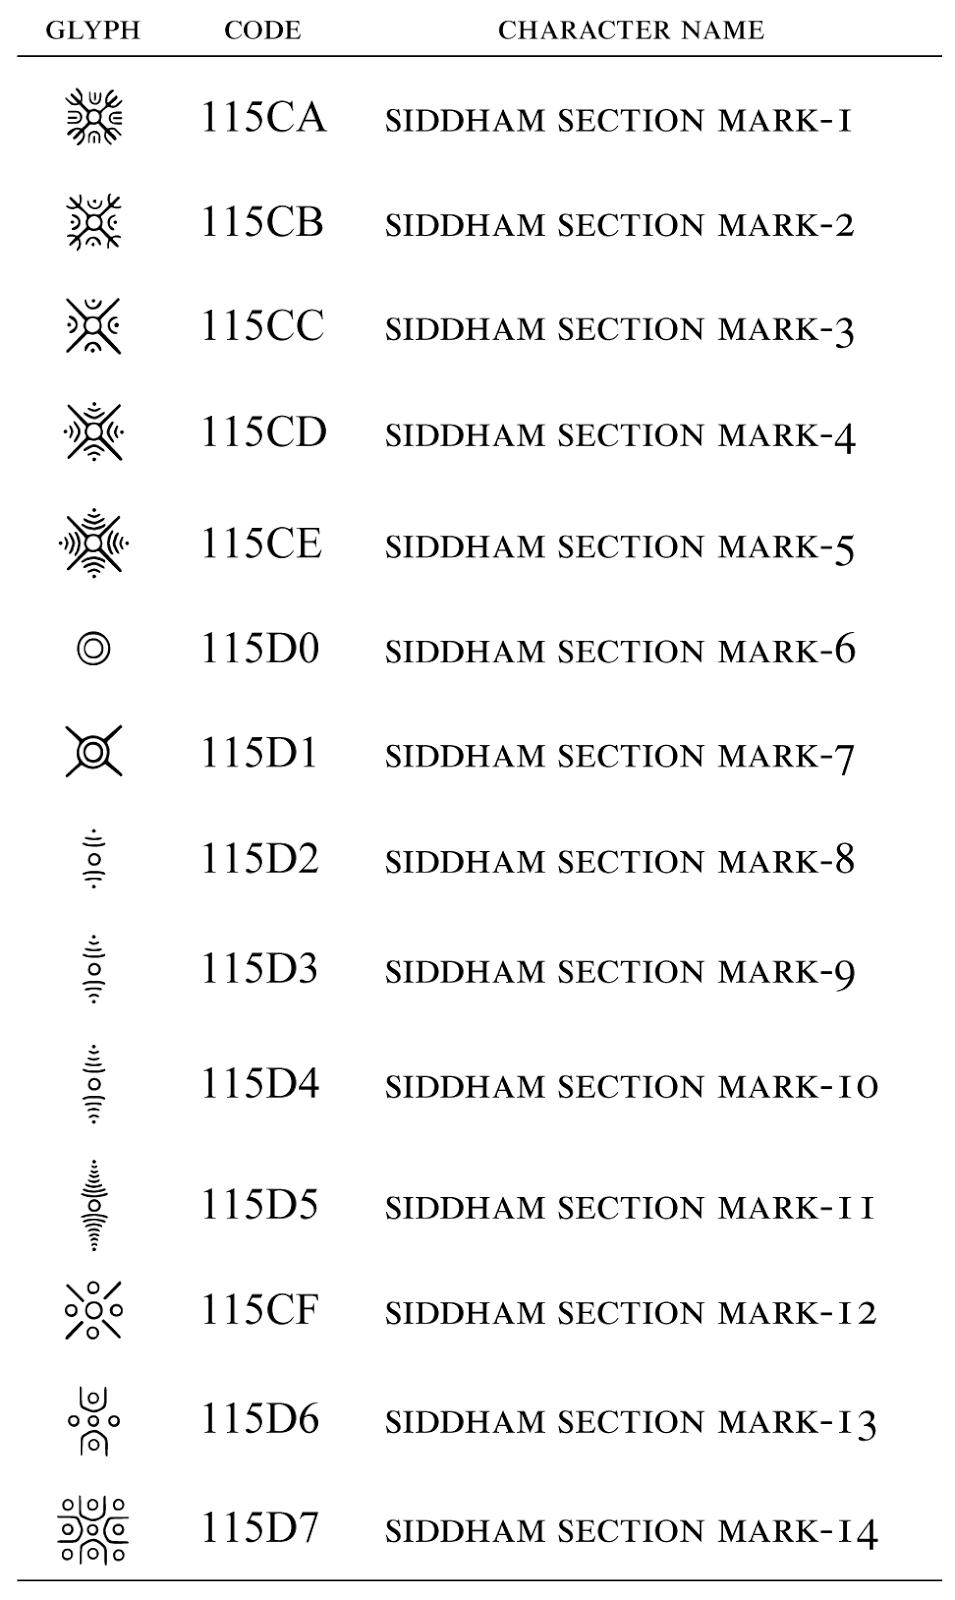 Siddham script anshuman pandey siddham ornaments beyond siddham script anshuman pandey siddham ornaments beyond punctuation buycottarizona Choice Image